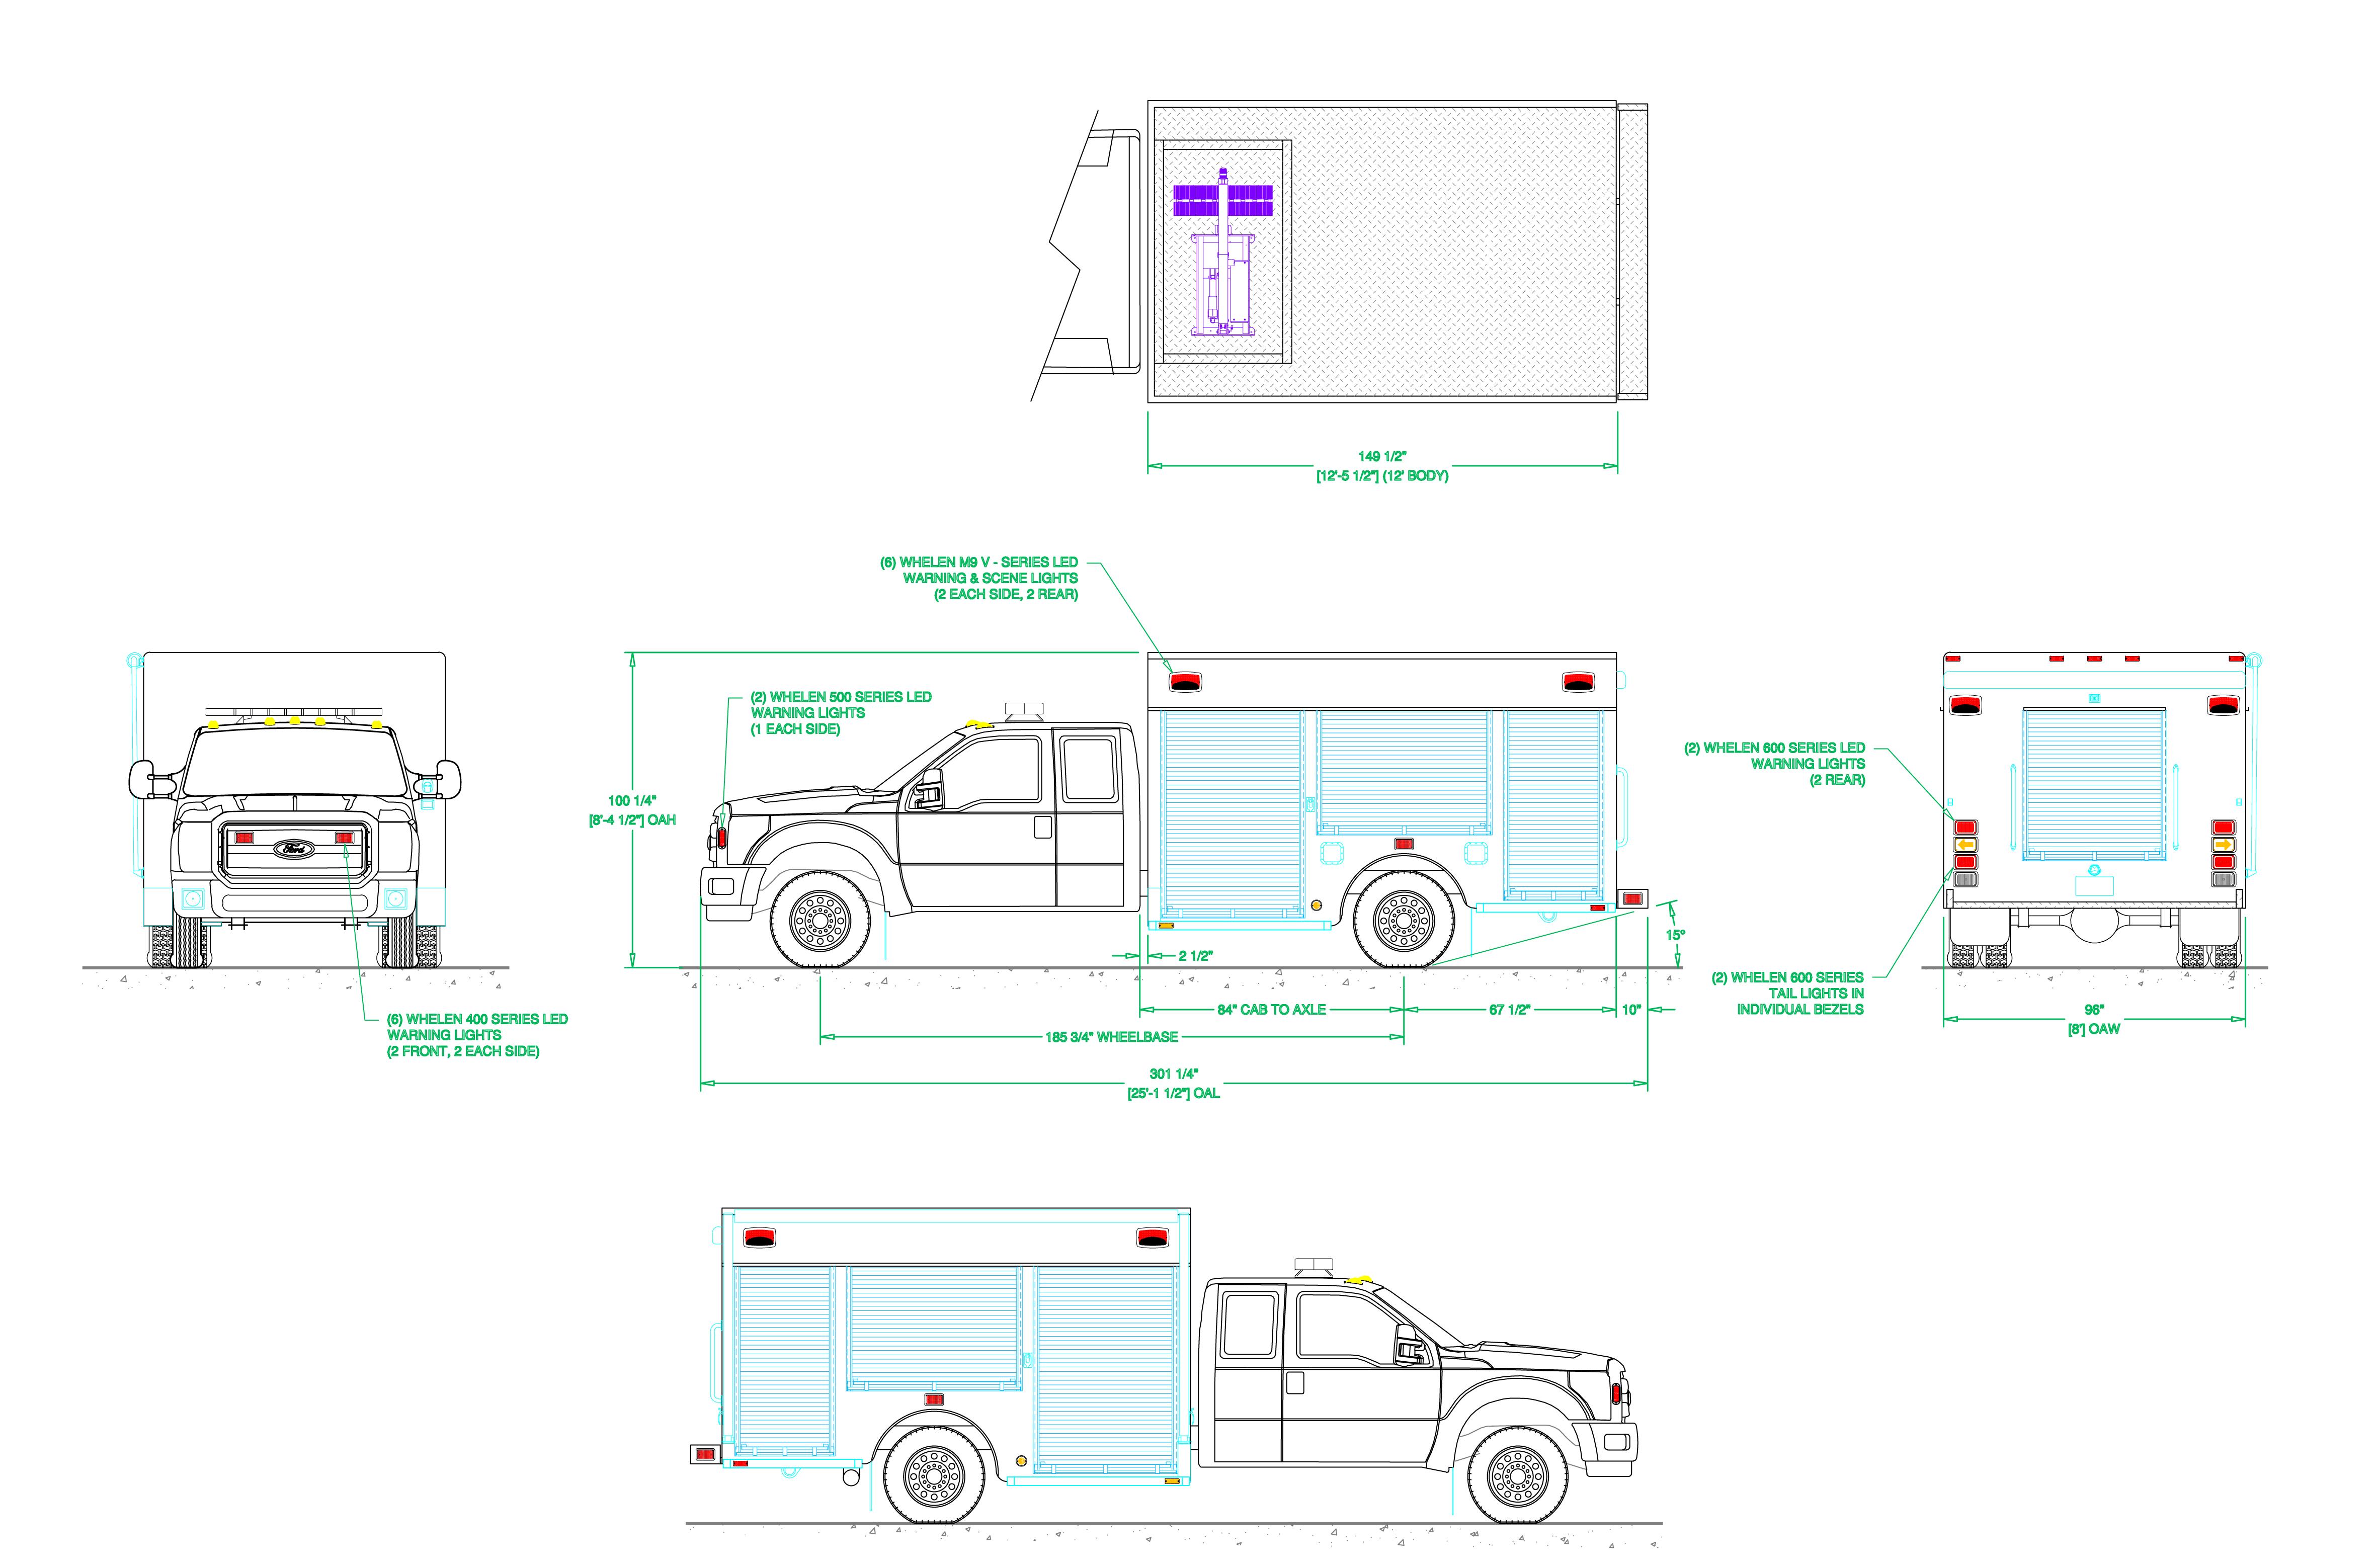 A Diagram For Whelen 400 Series Detailed Schematics Wiring Ulf44 East Point Ga Fire Department Air Light 1014 Svi Trucks